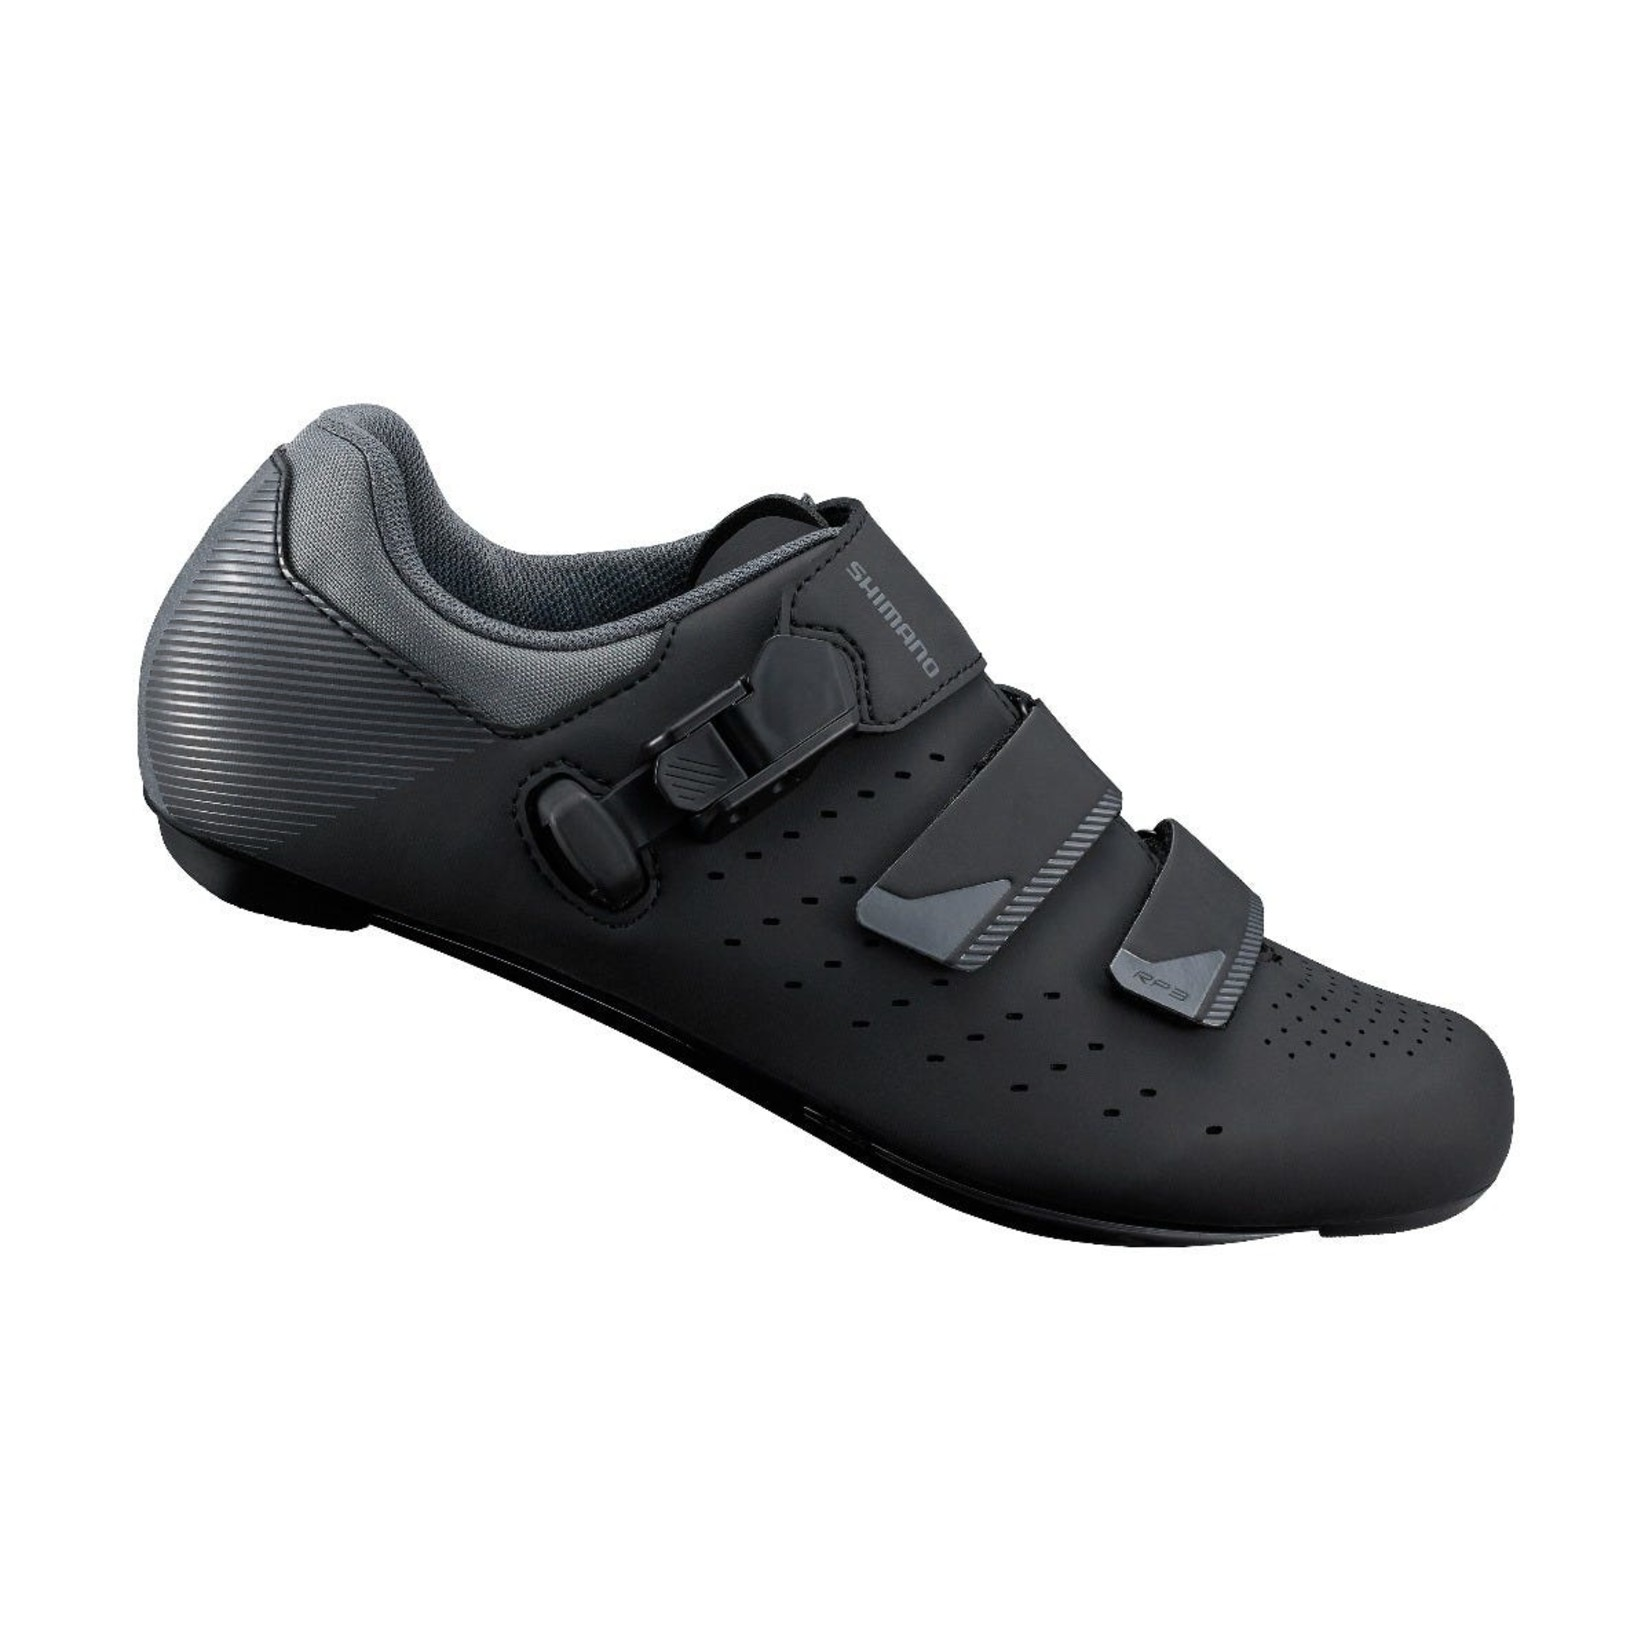 Shimano RP3 Road Shoes Black 42